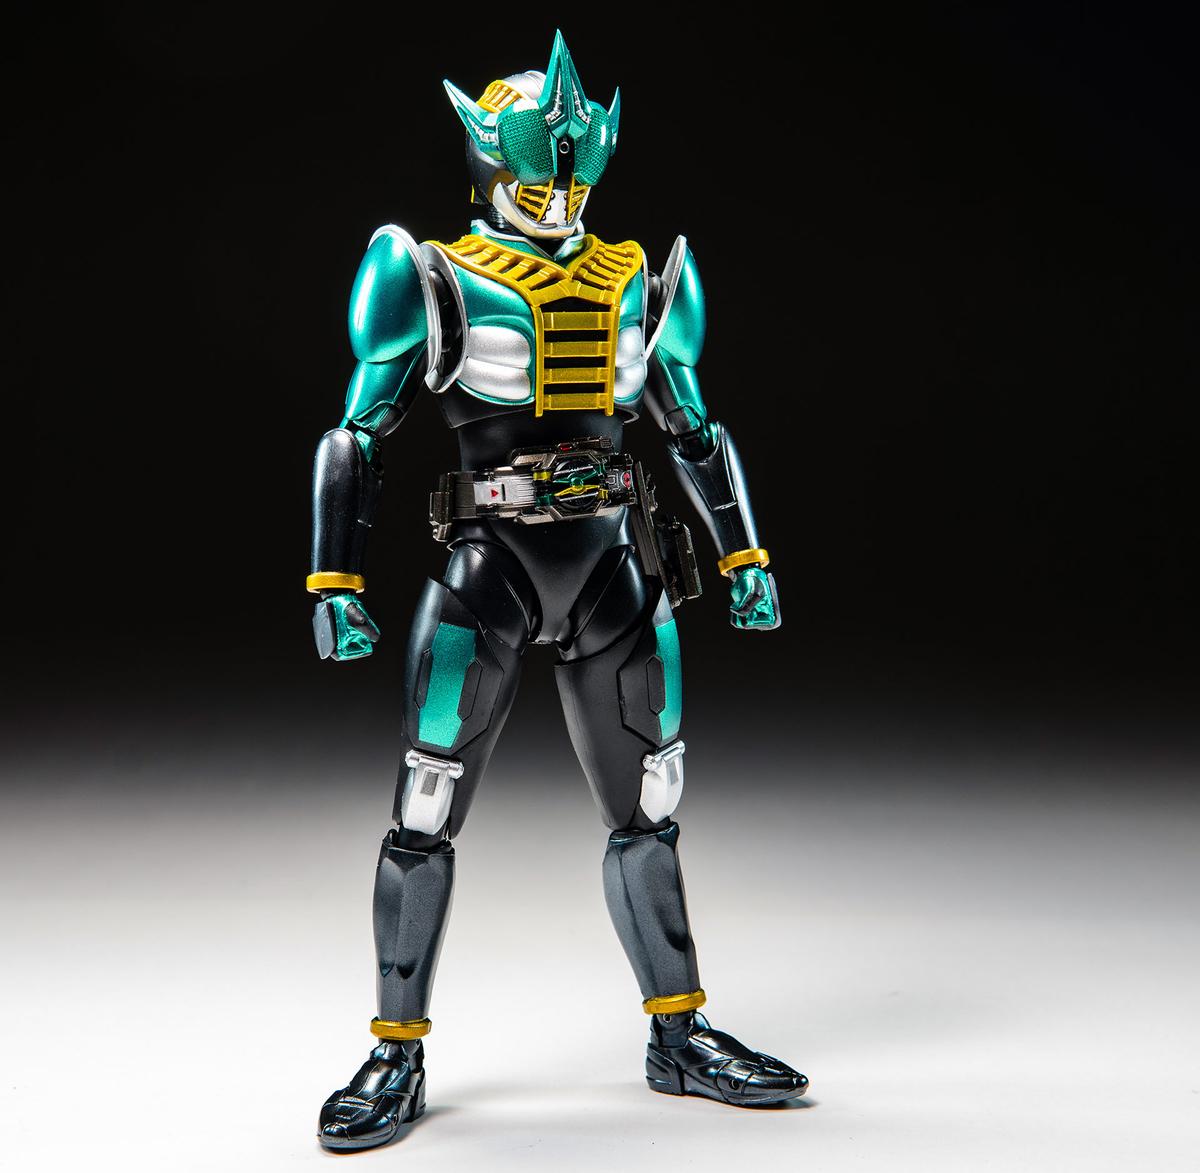 f:id:hiroban-ch:20210929221512j:plain